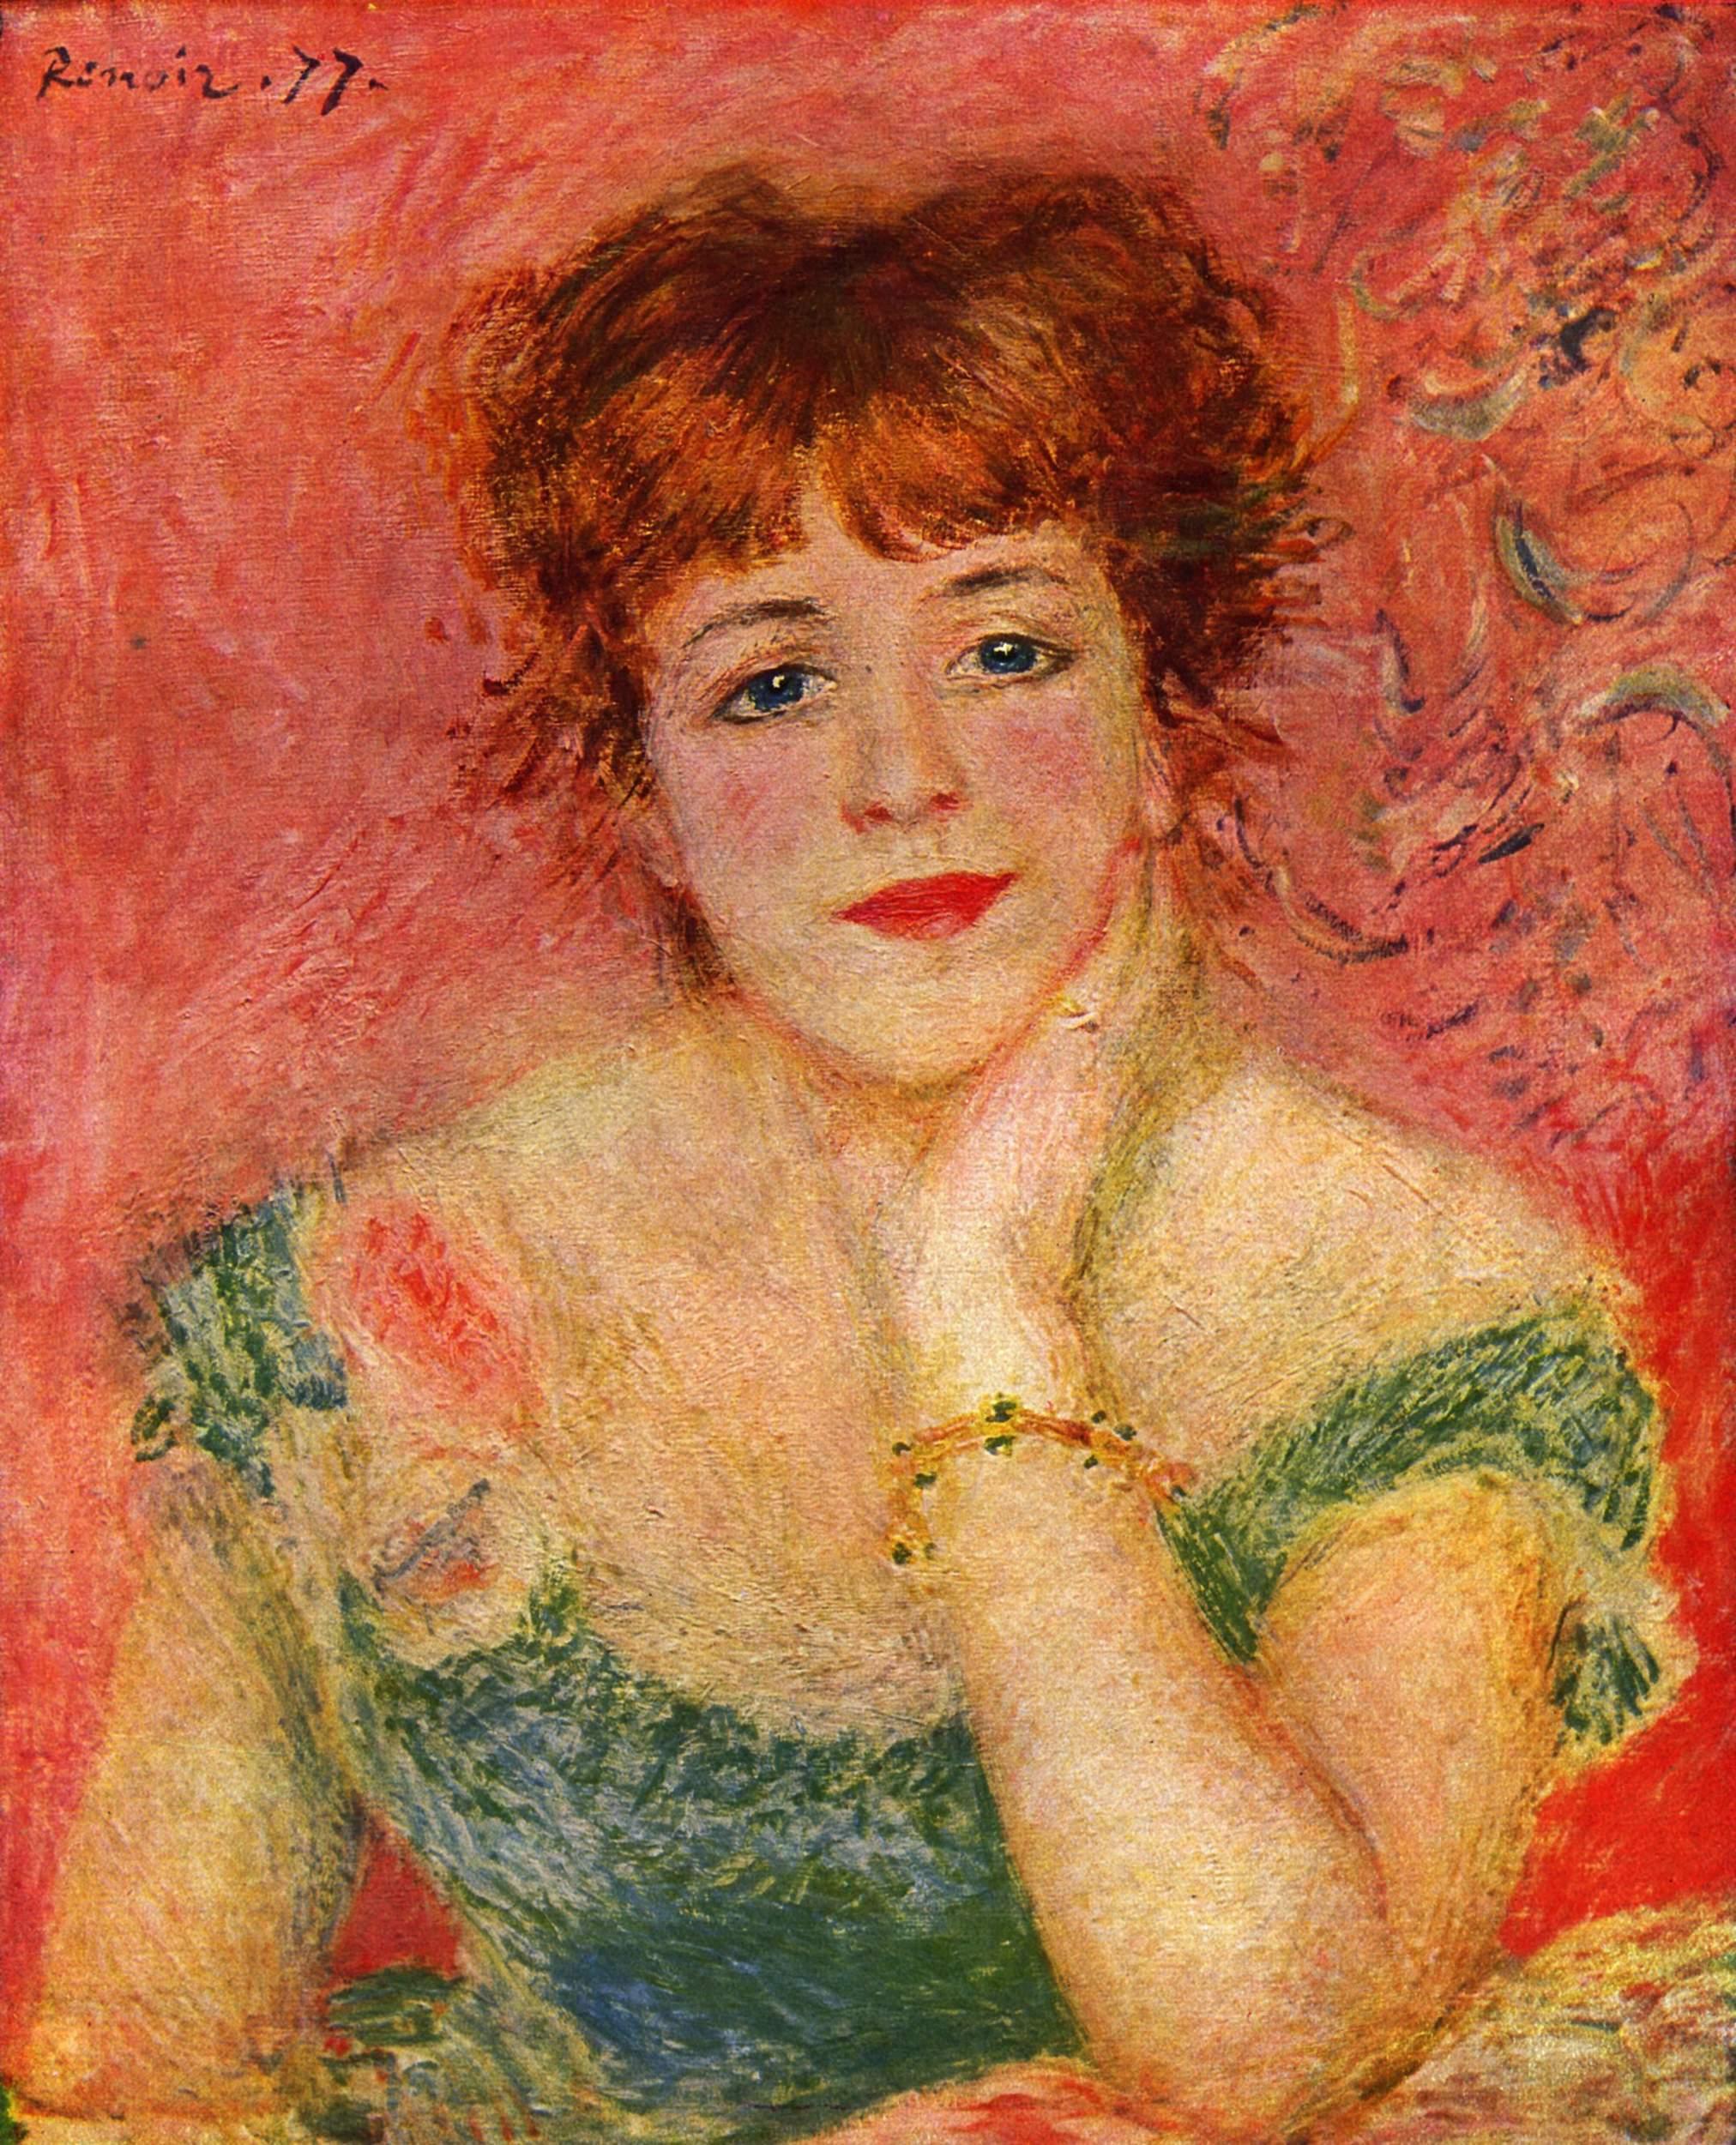 Daydream by Renoir